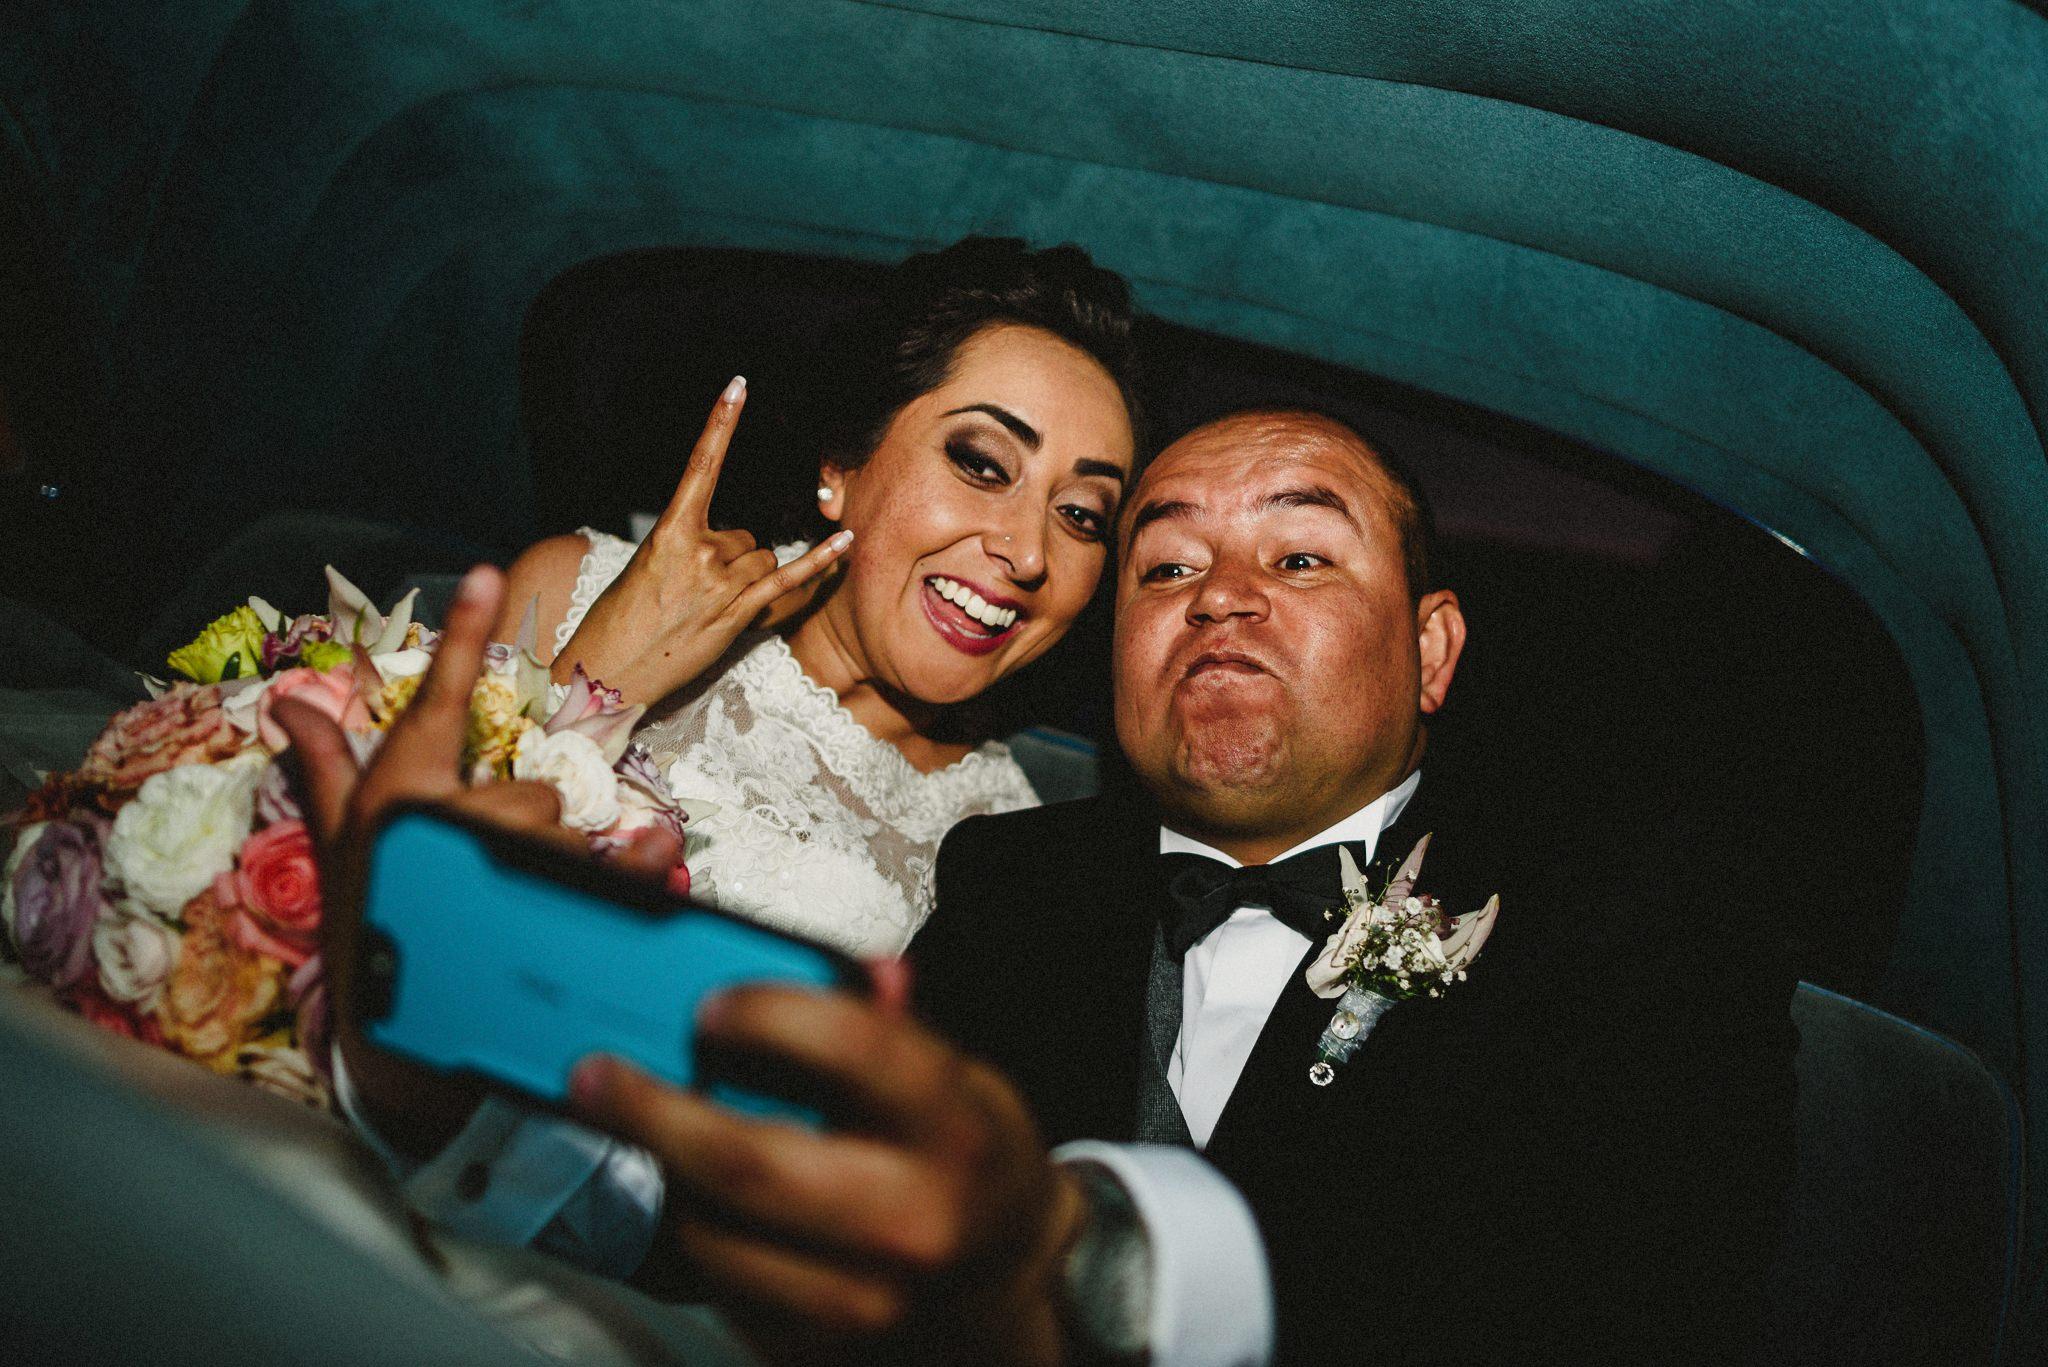 Wedding-Boda-Tulancingo-Hidalgo-Salon-Essenzia-Luis-Houdin-37-film